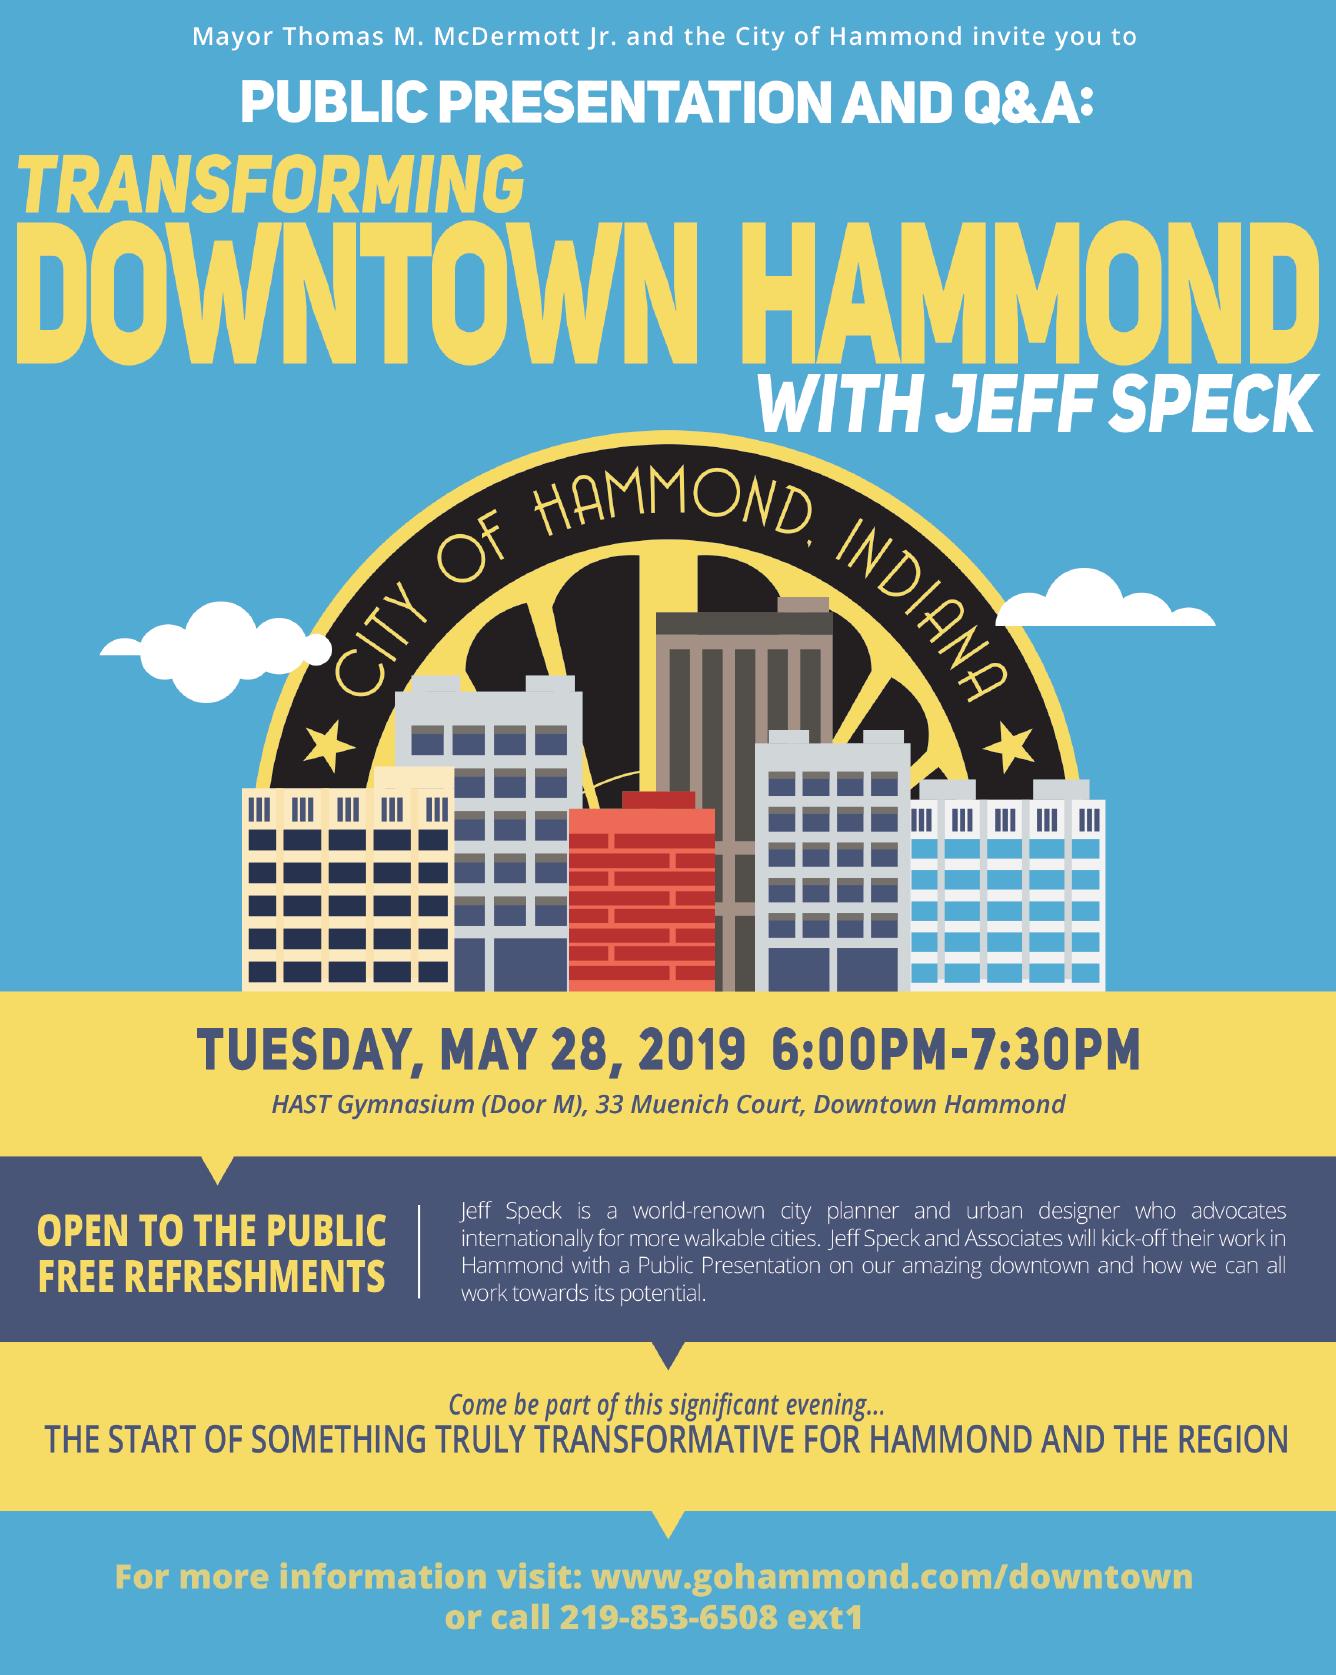 Transforming Downtown Hammond